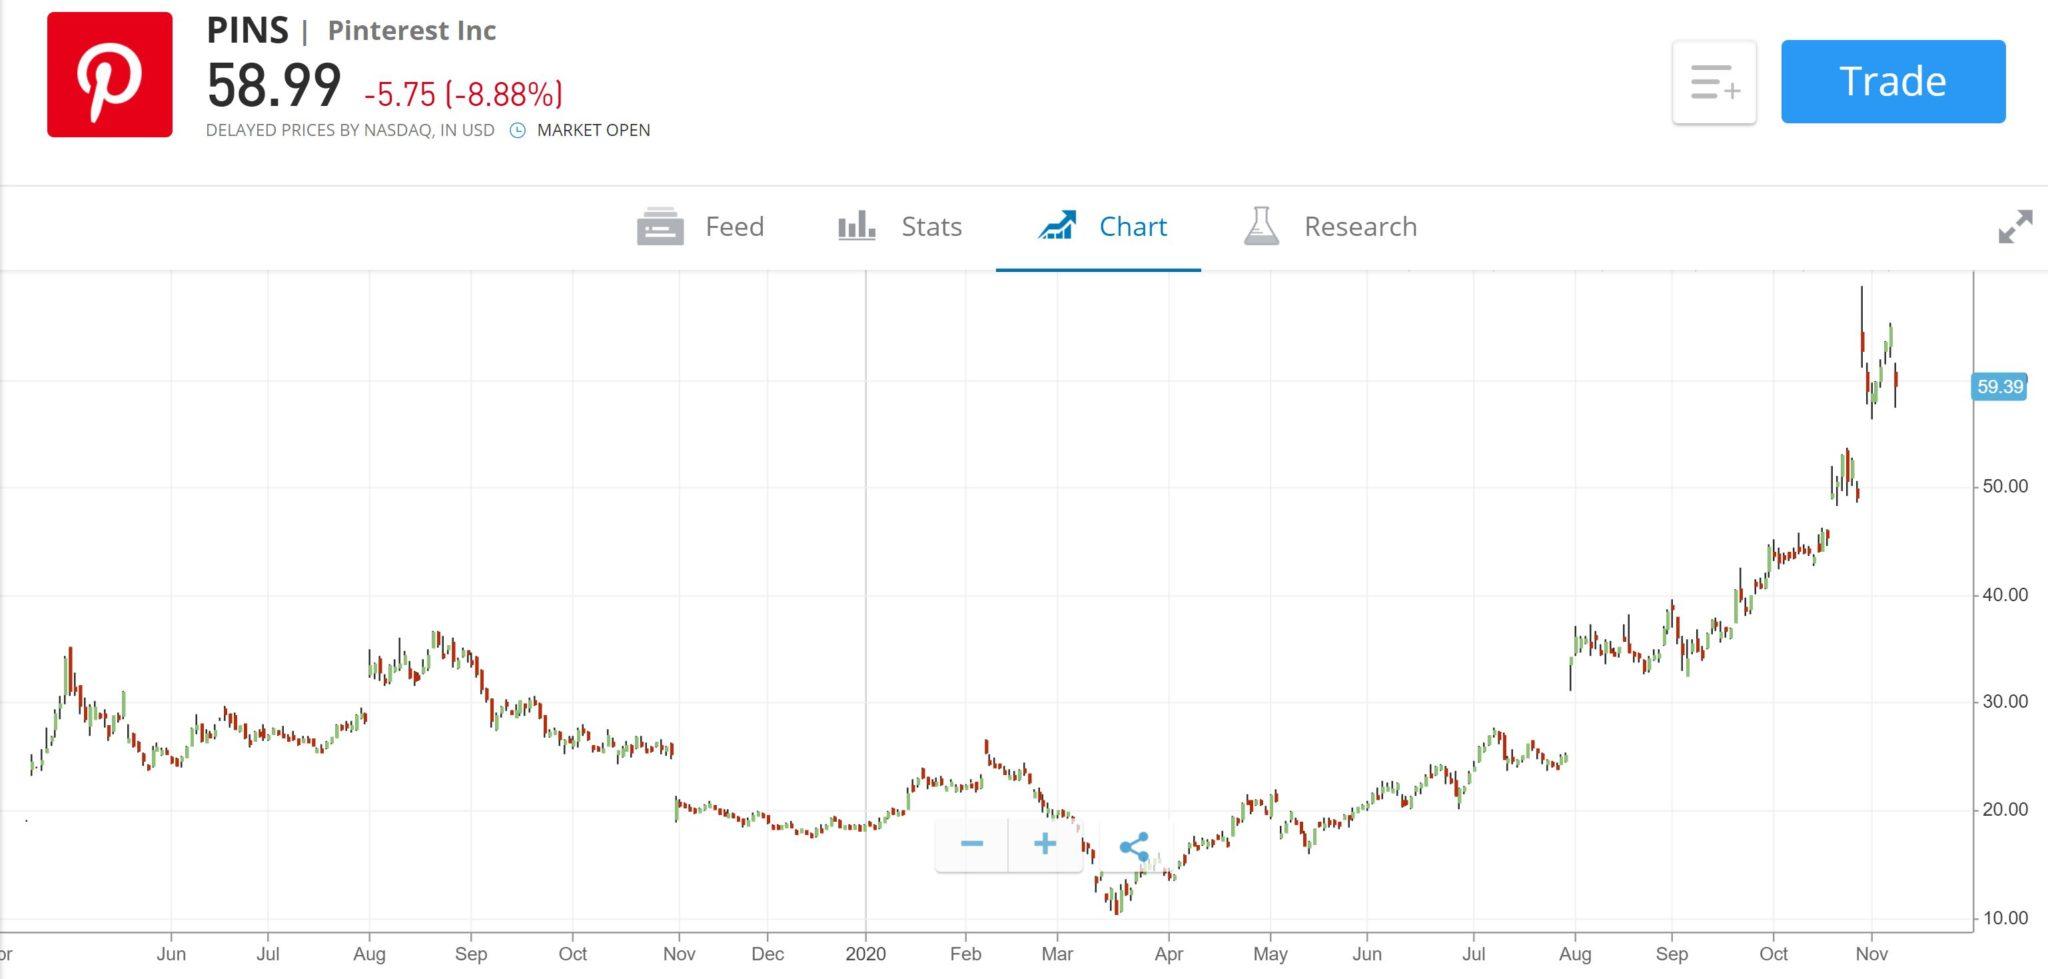 Pinterest Stock Price Chart